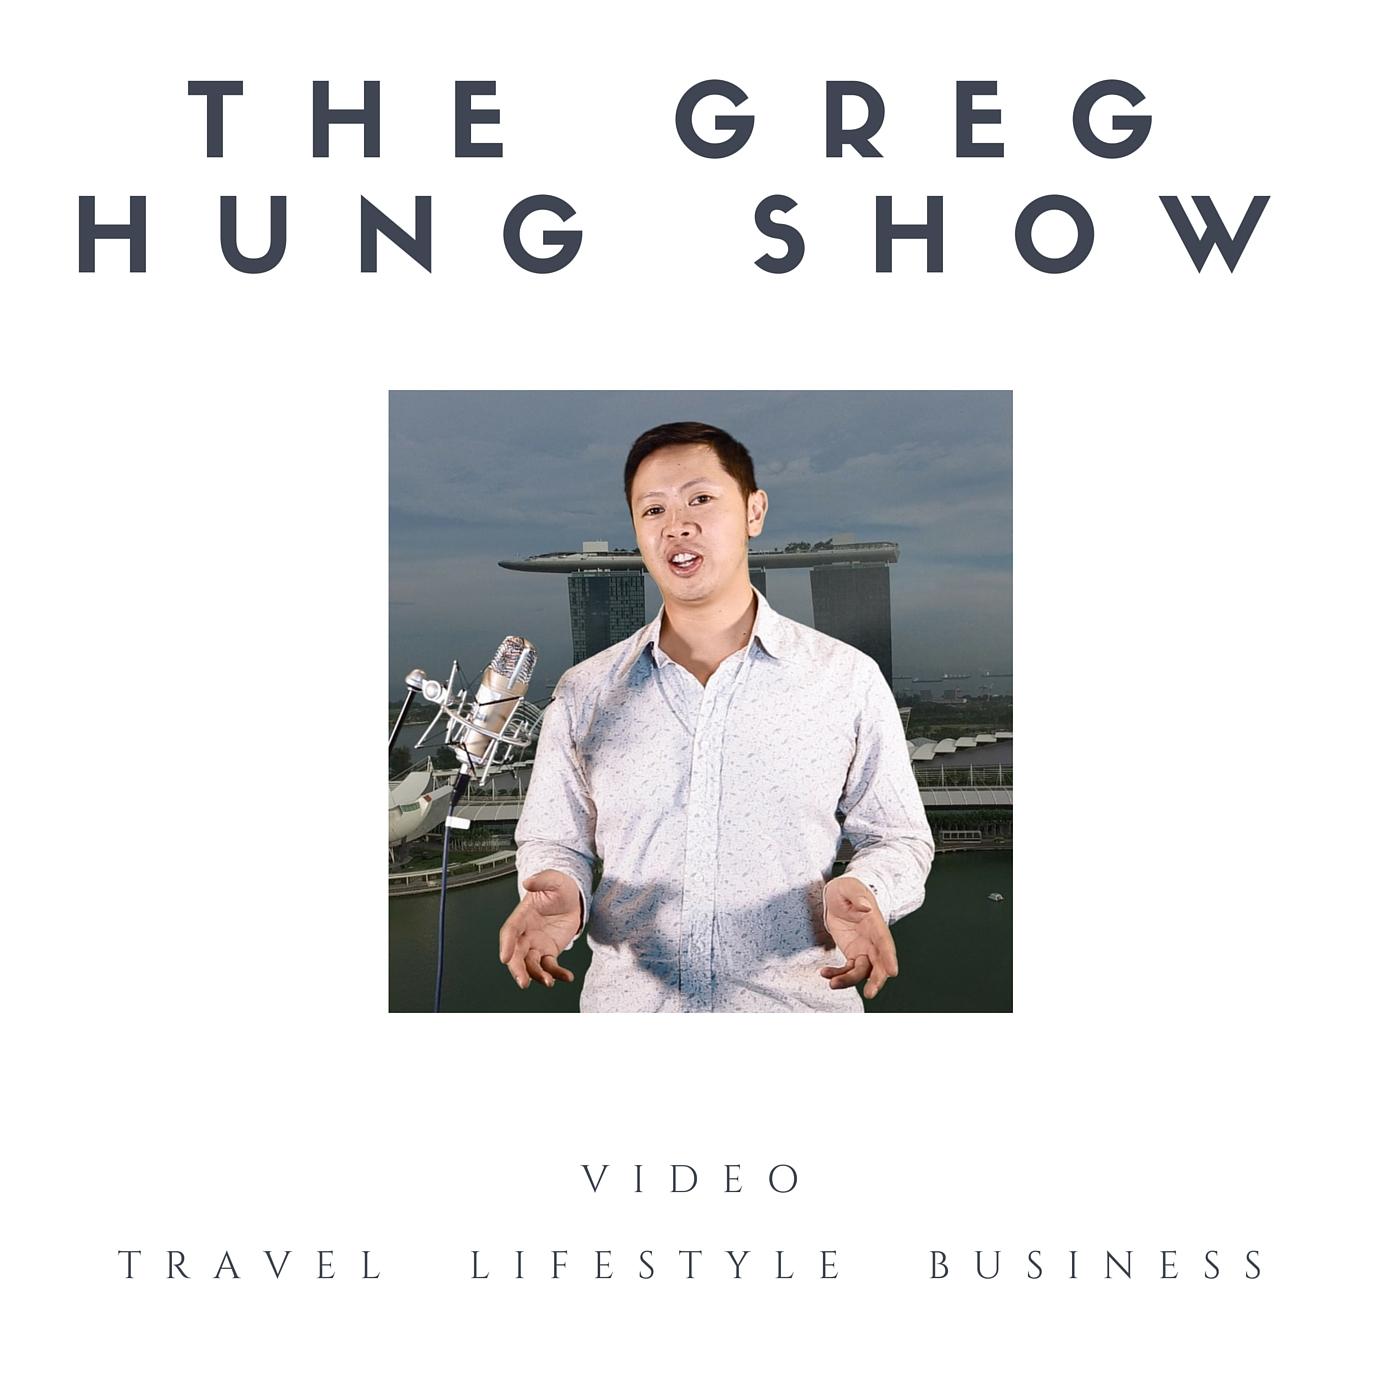 greg hung show-1